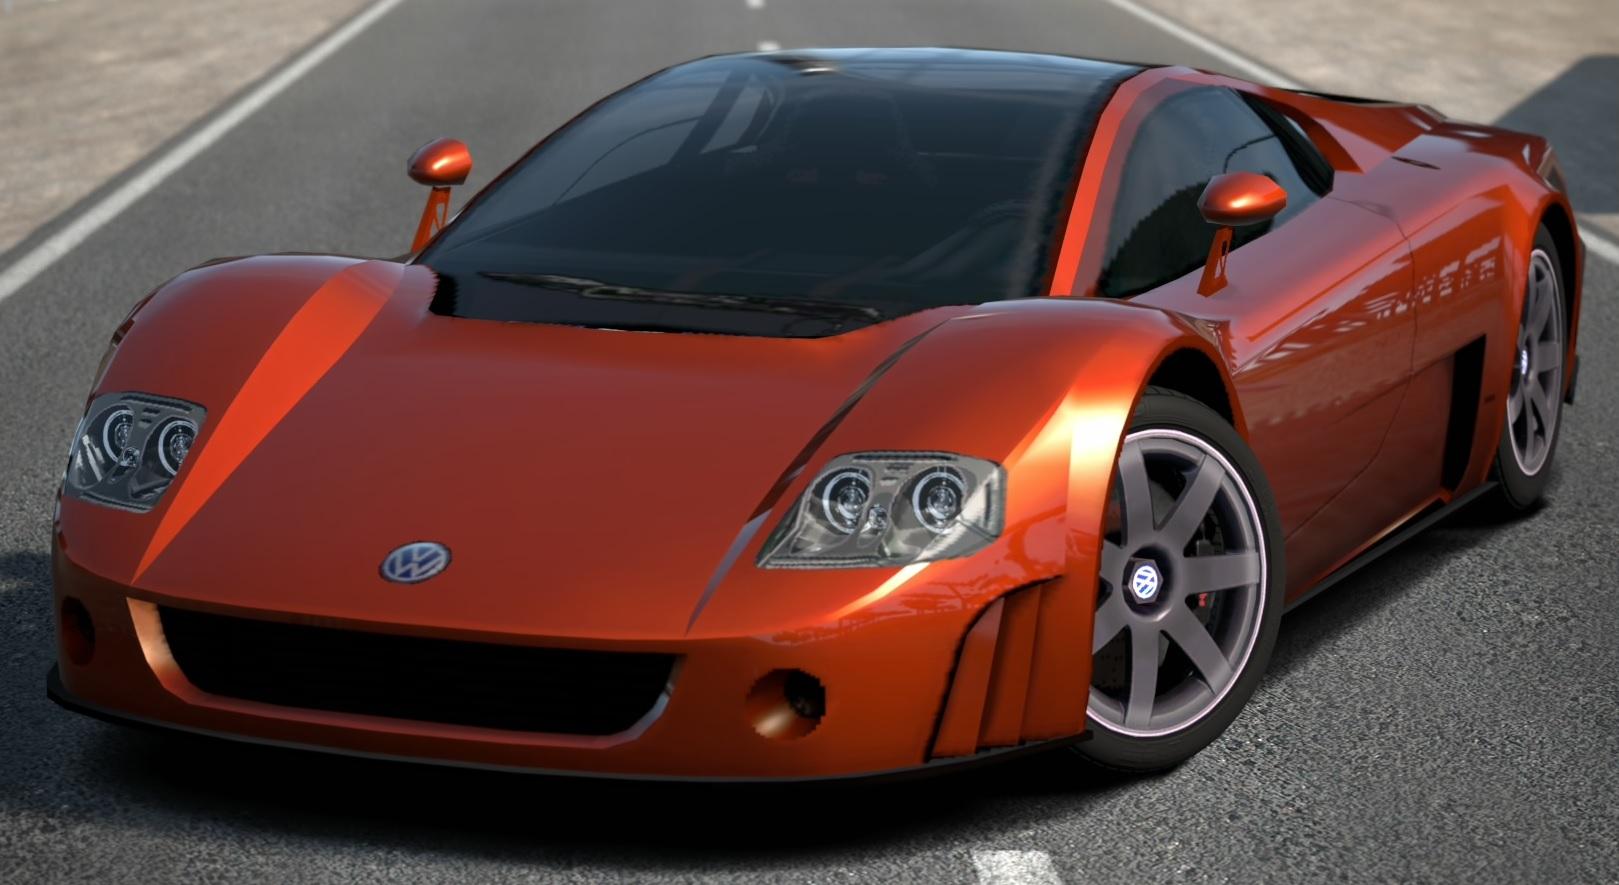 Volkswagen W12 Nardo Concept 01 Gran Turismo Wiki